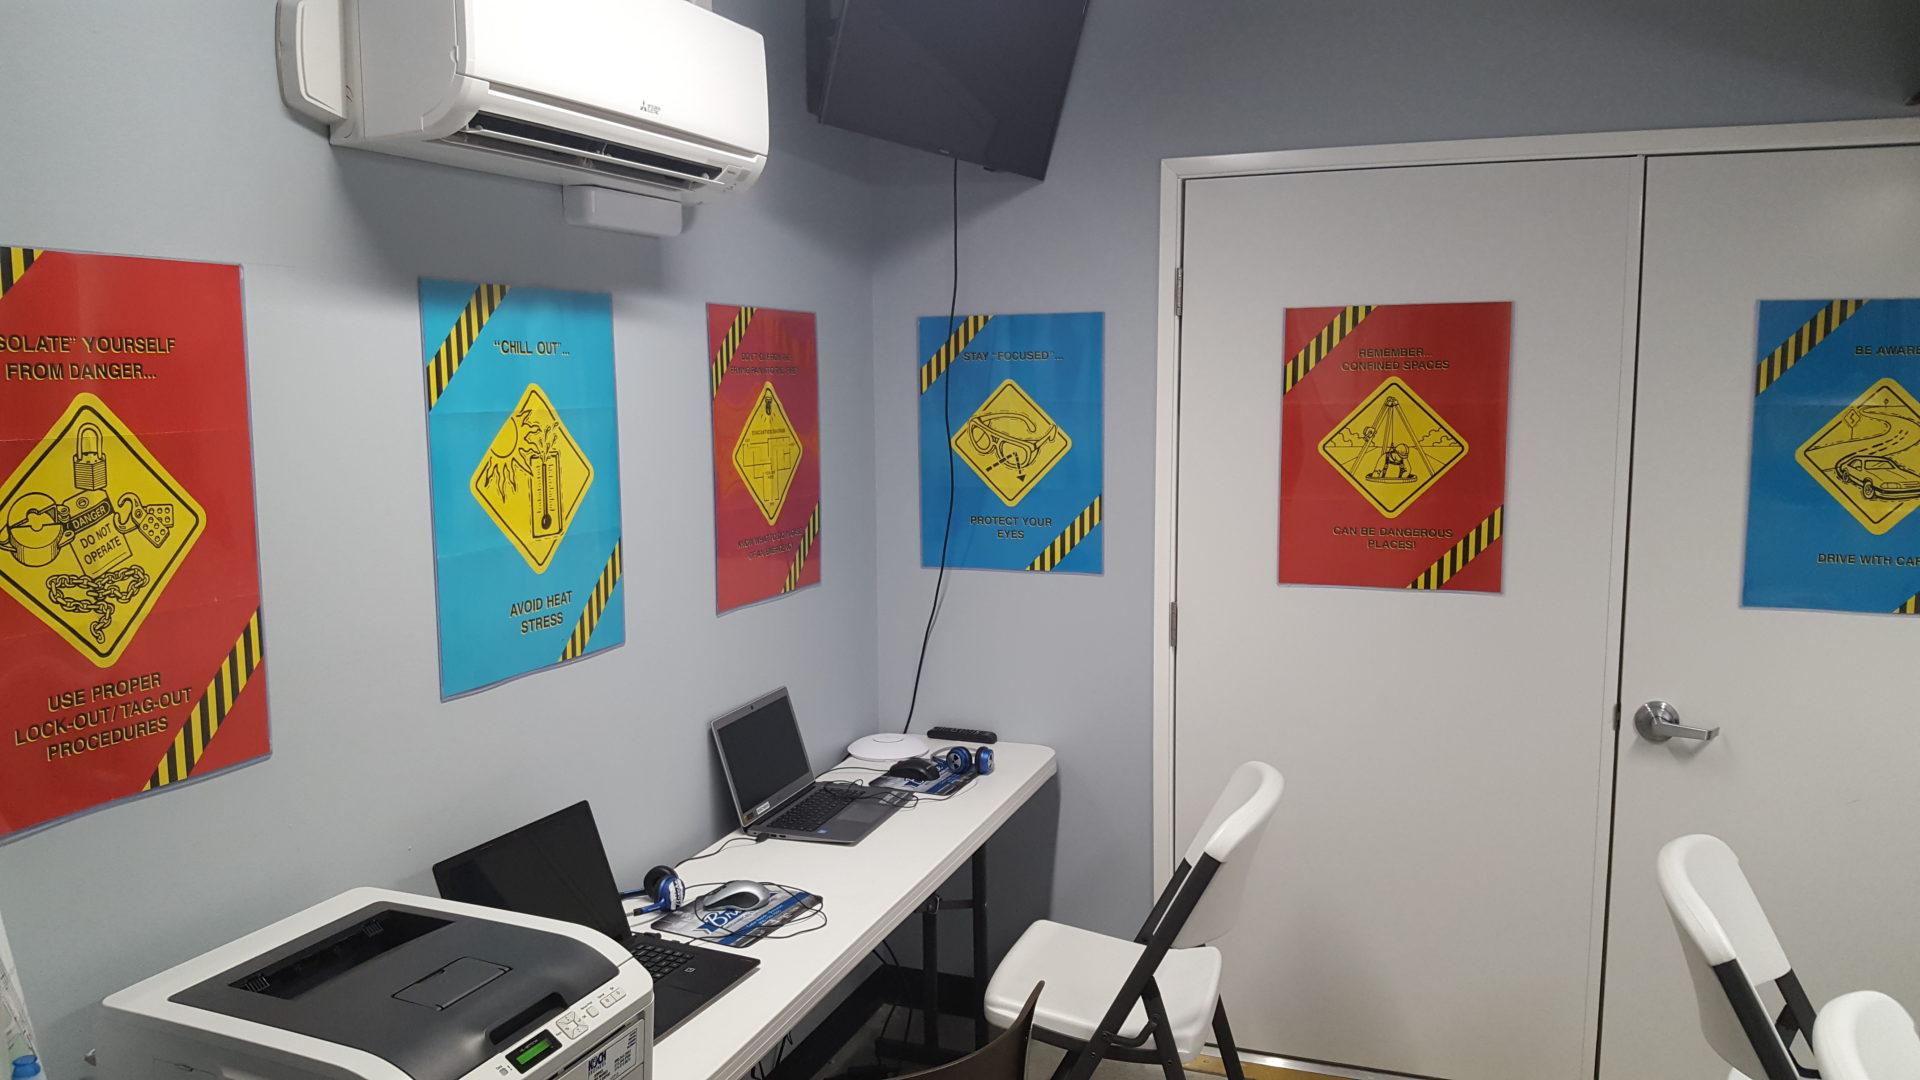 brecke safety training room